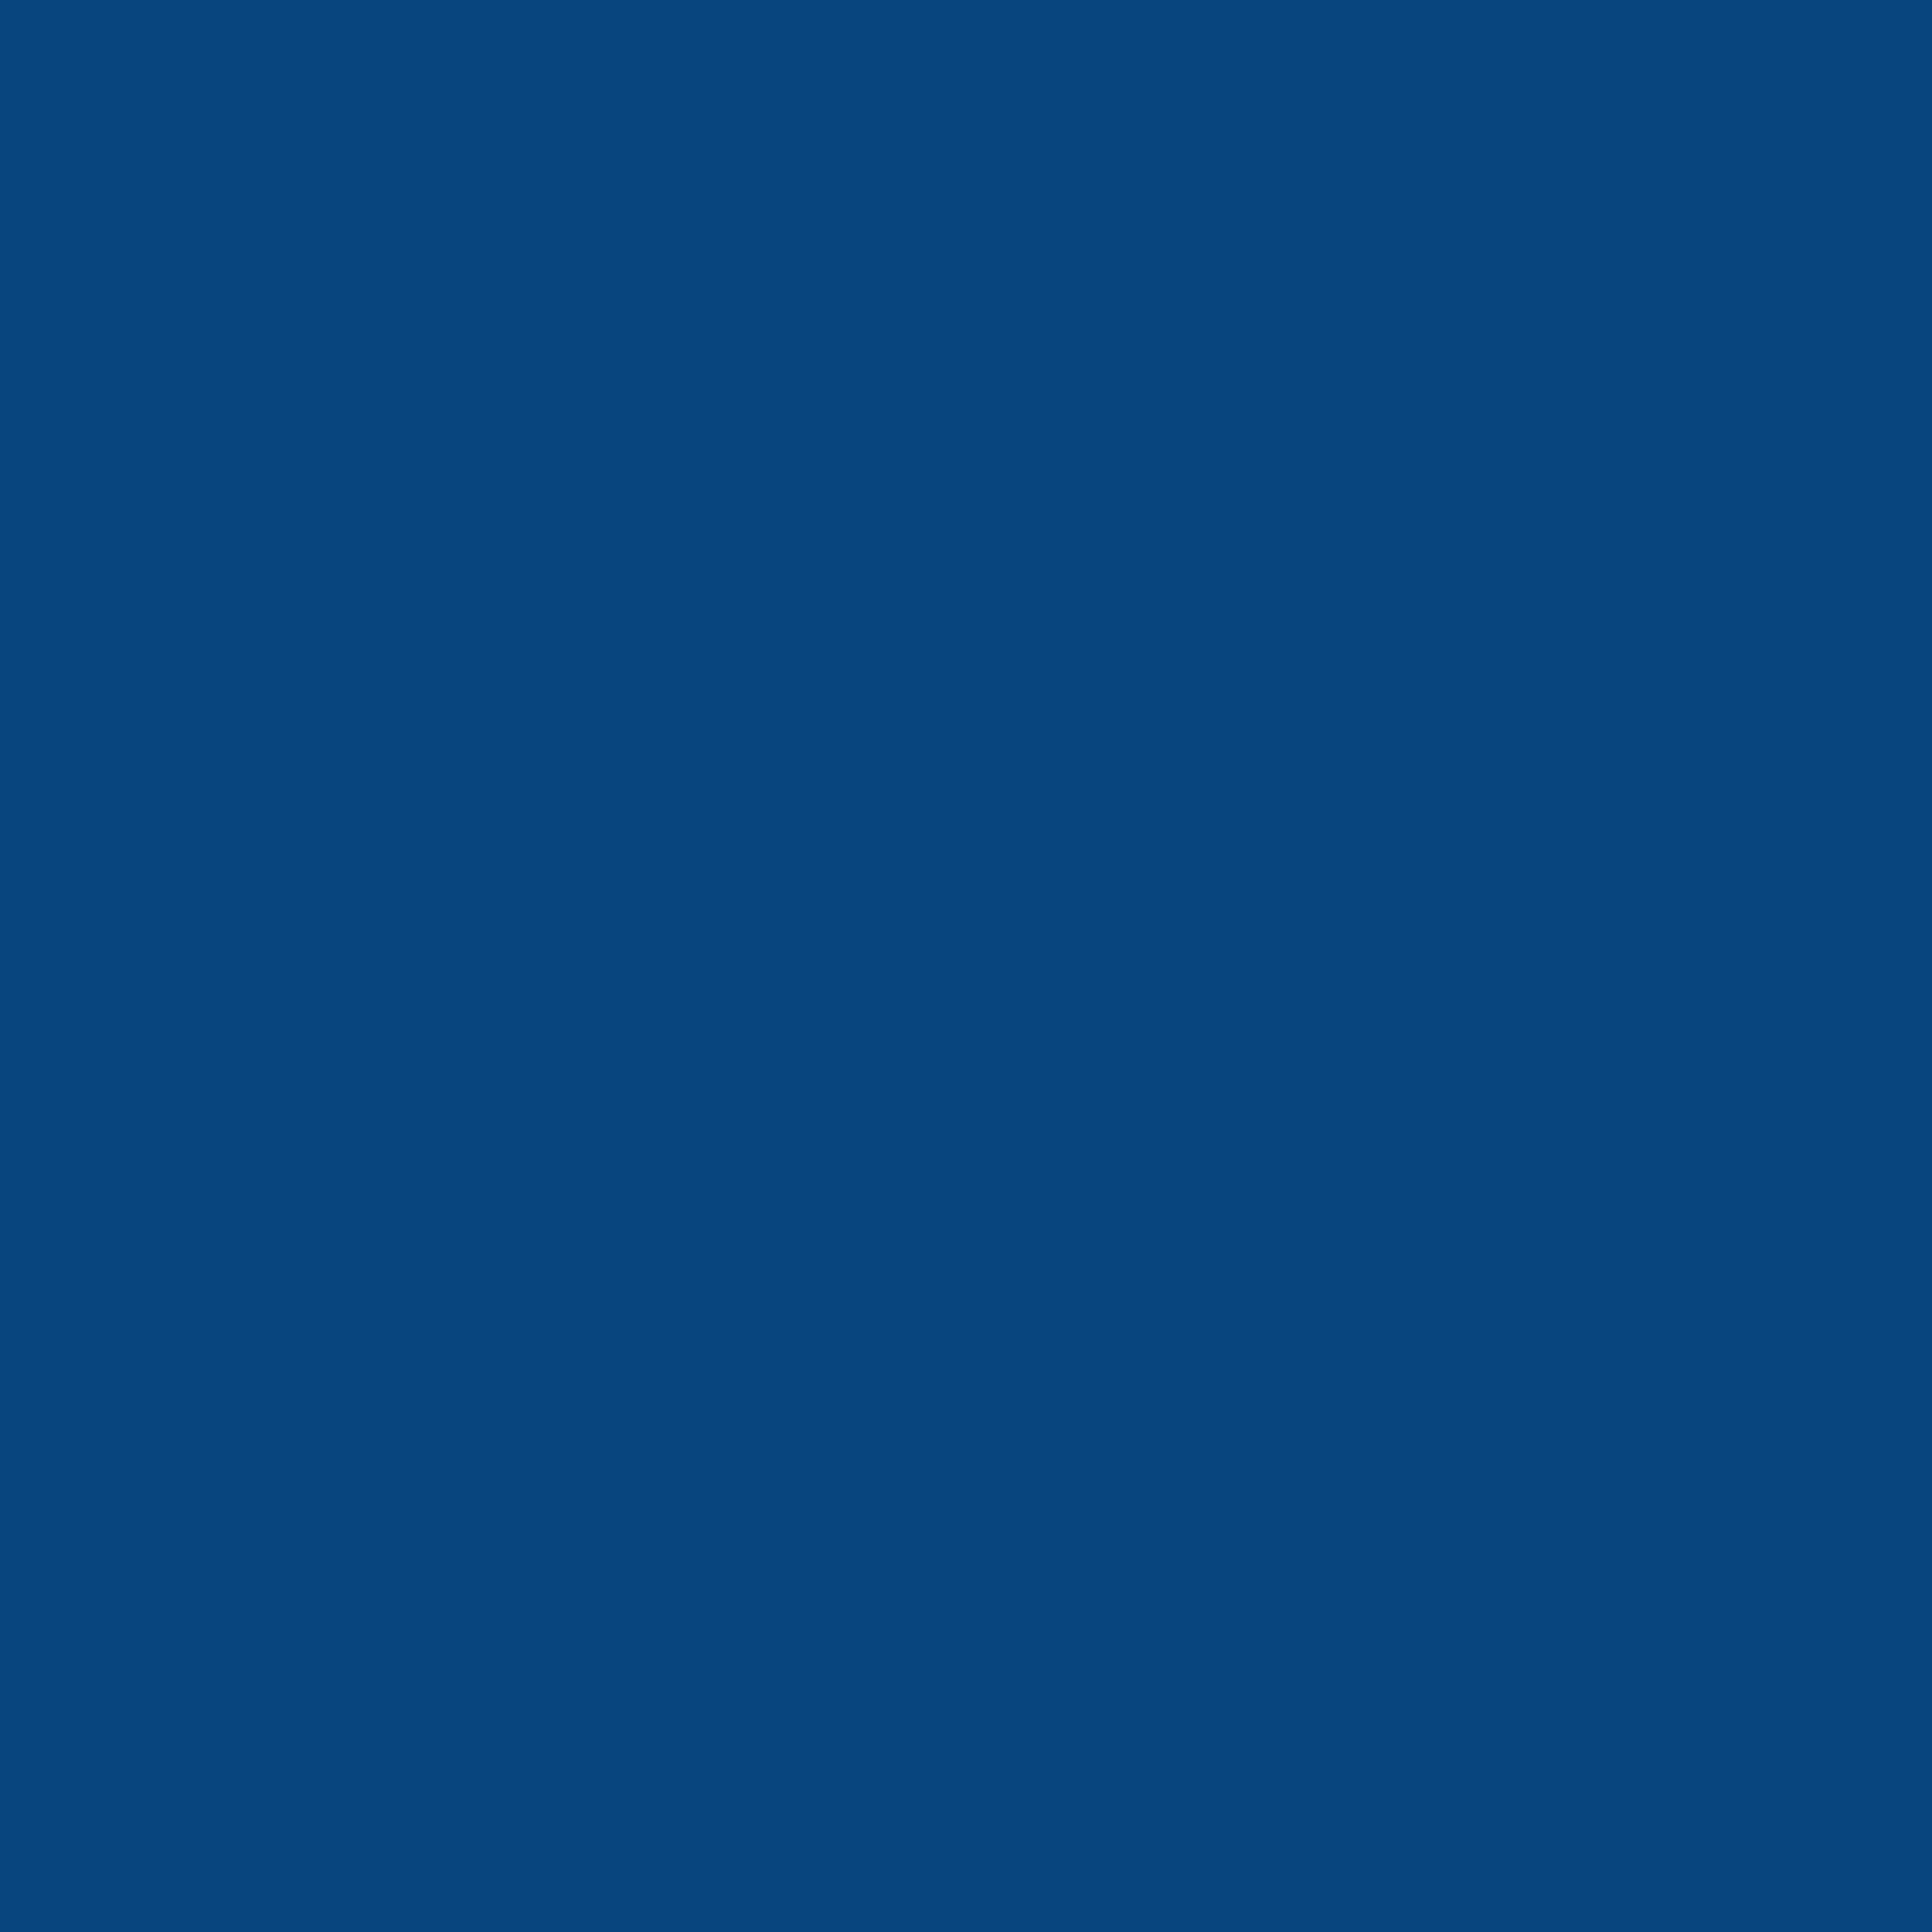 2732x2732 Dark Cerulean Solid Color Background